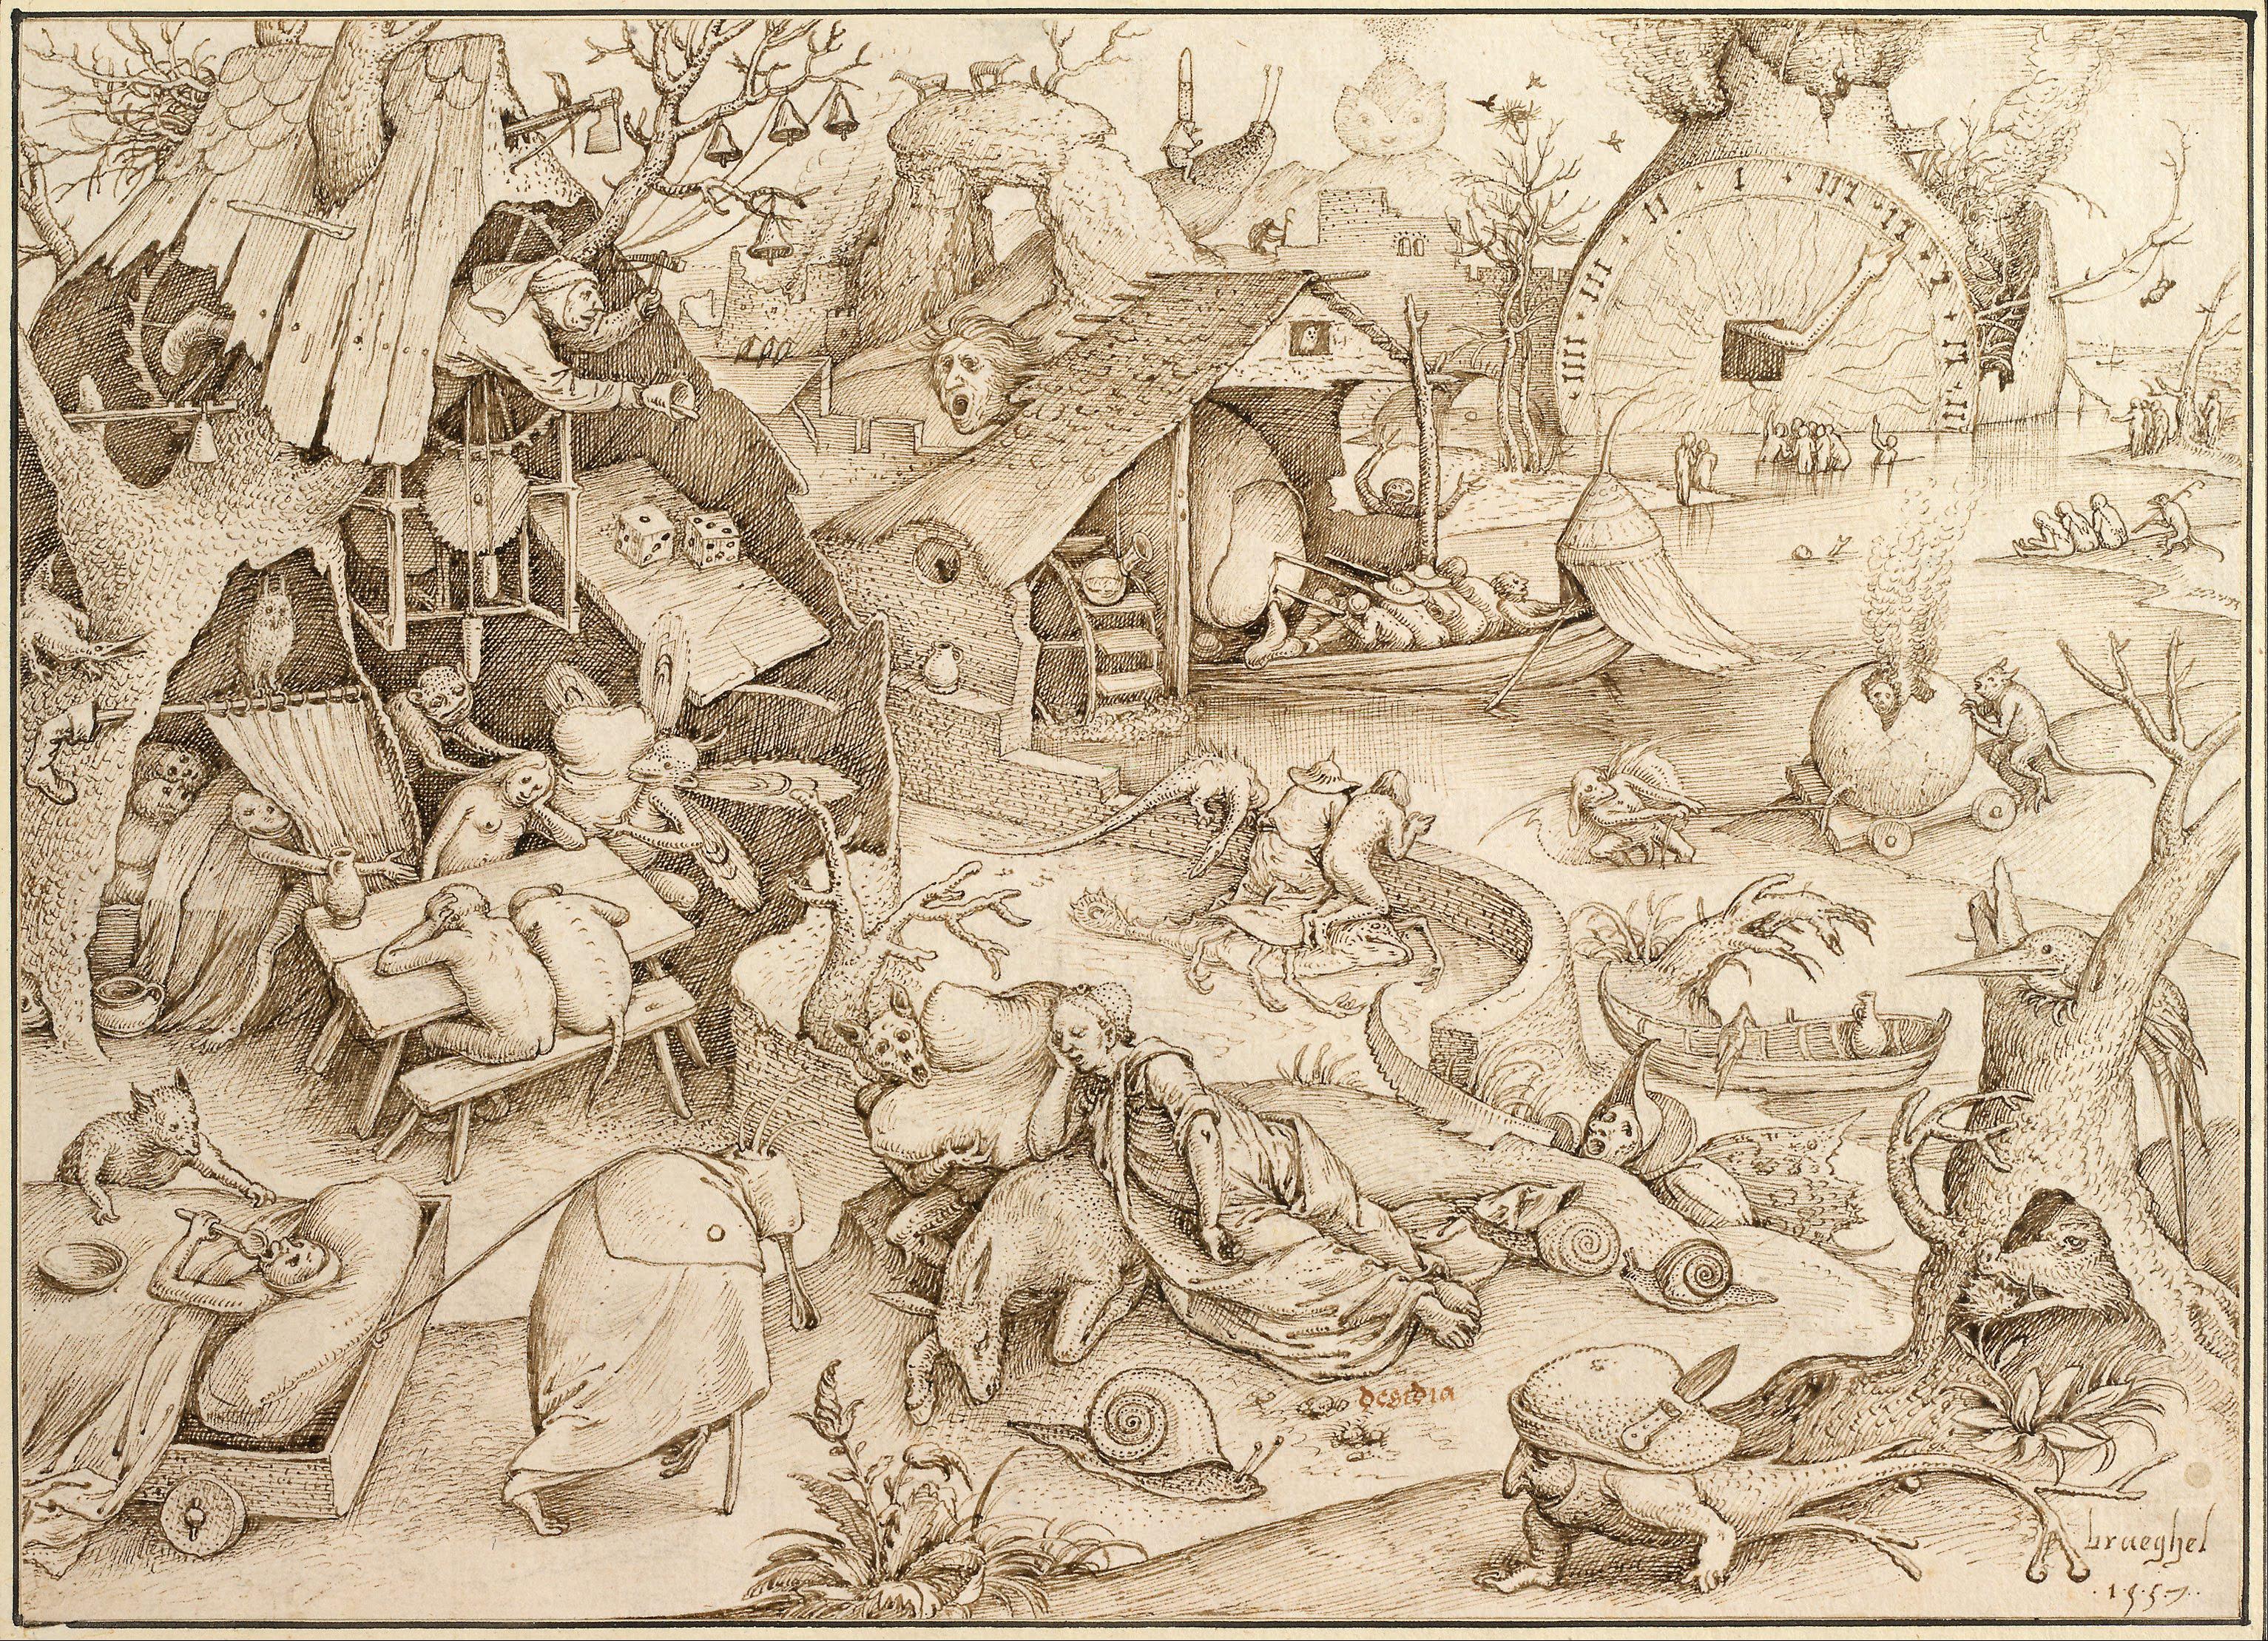 https://upload.wikimedia.org/wikipedia/commons/3/30/Pieter_Bruegel_the_Elder_-_Desidia_%28Sloth%29%2C_1557_-_Google_Art_Project.jpg